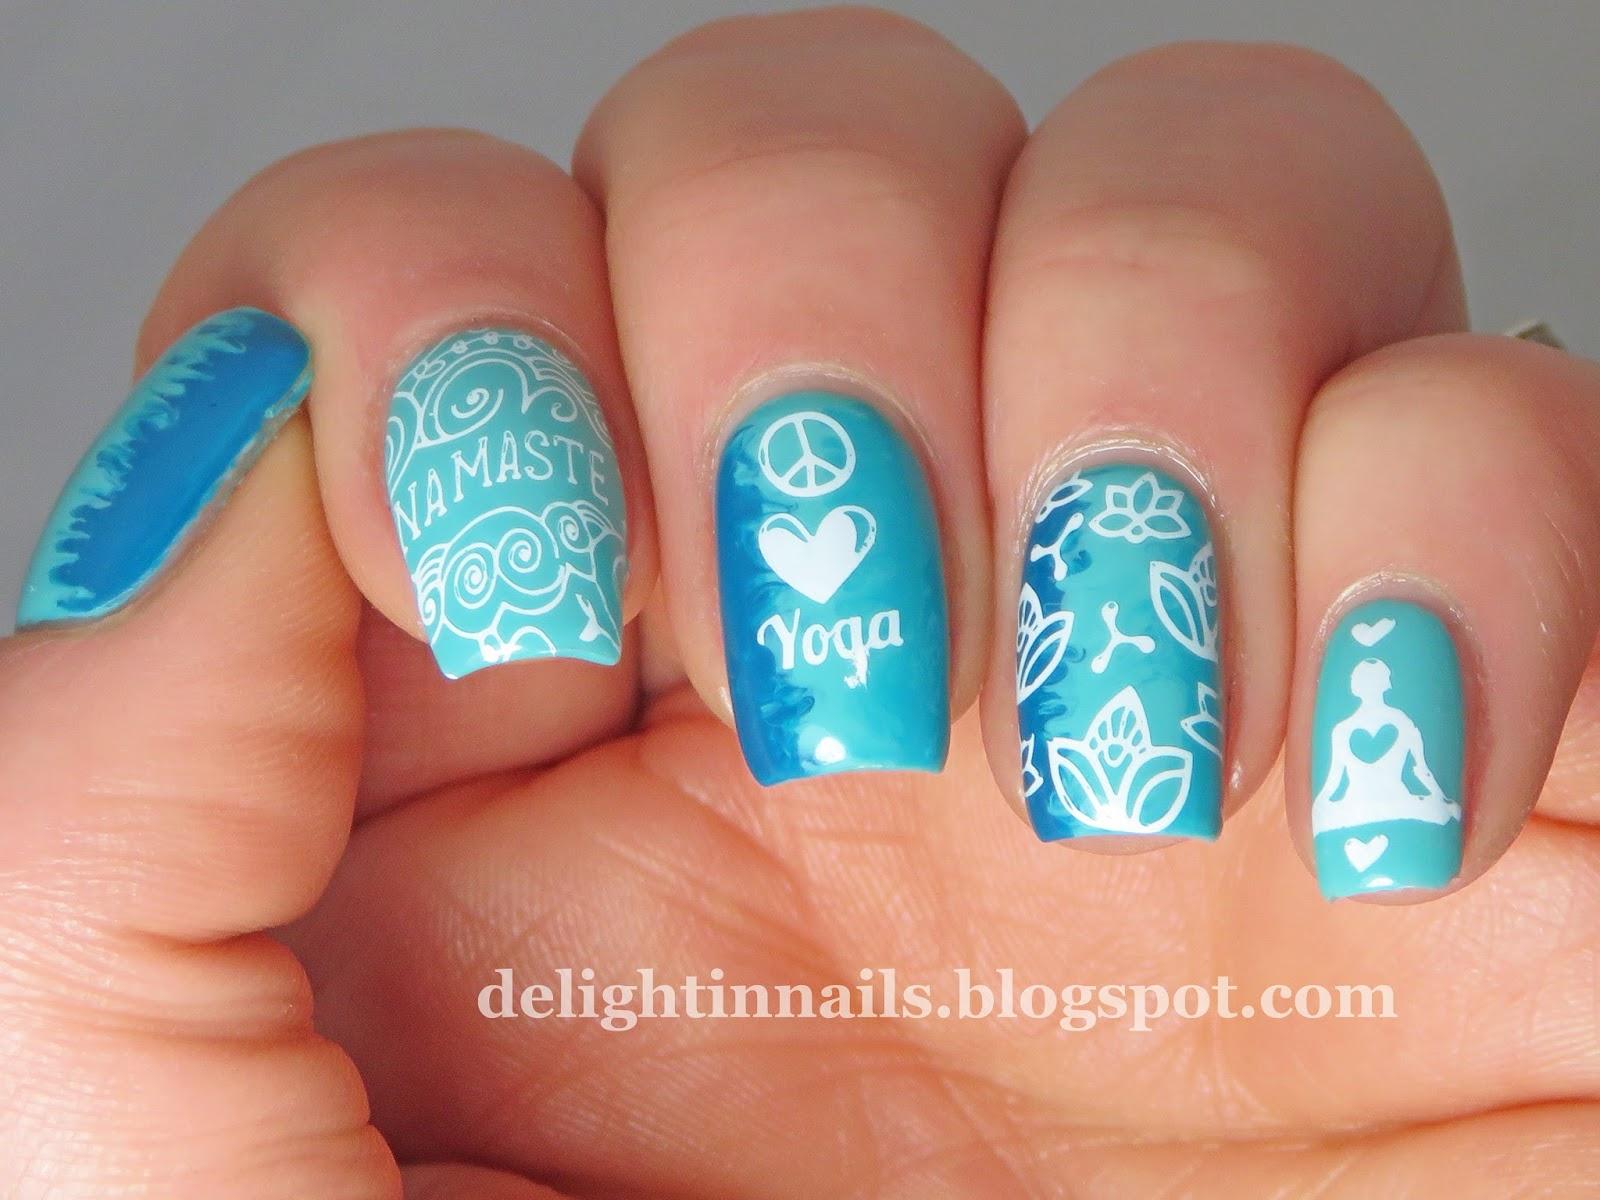 Delight in nails 40 great nail art ideas aqua or turquoise 40 great nail art ideas aqua or turquoise prinsesfo Choice Image